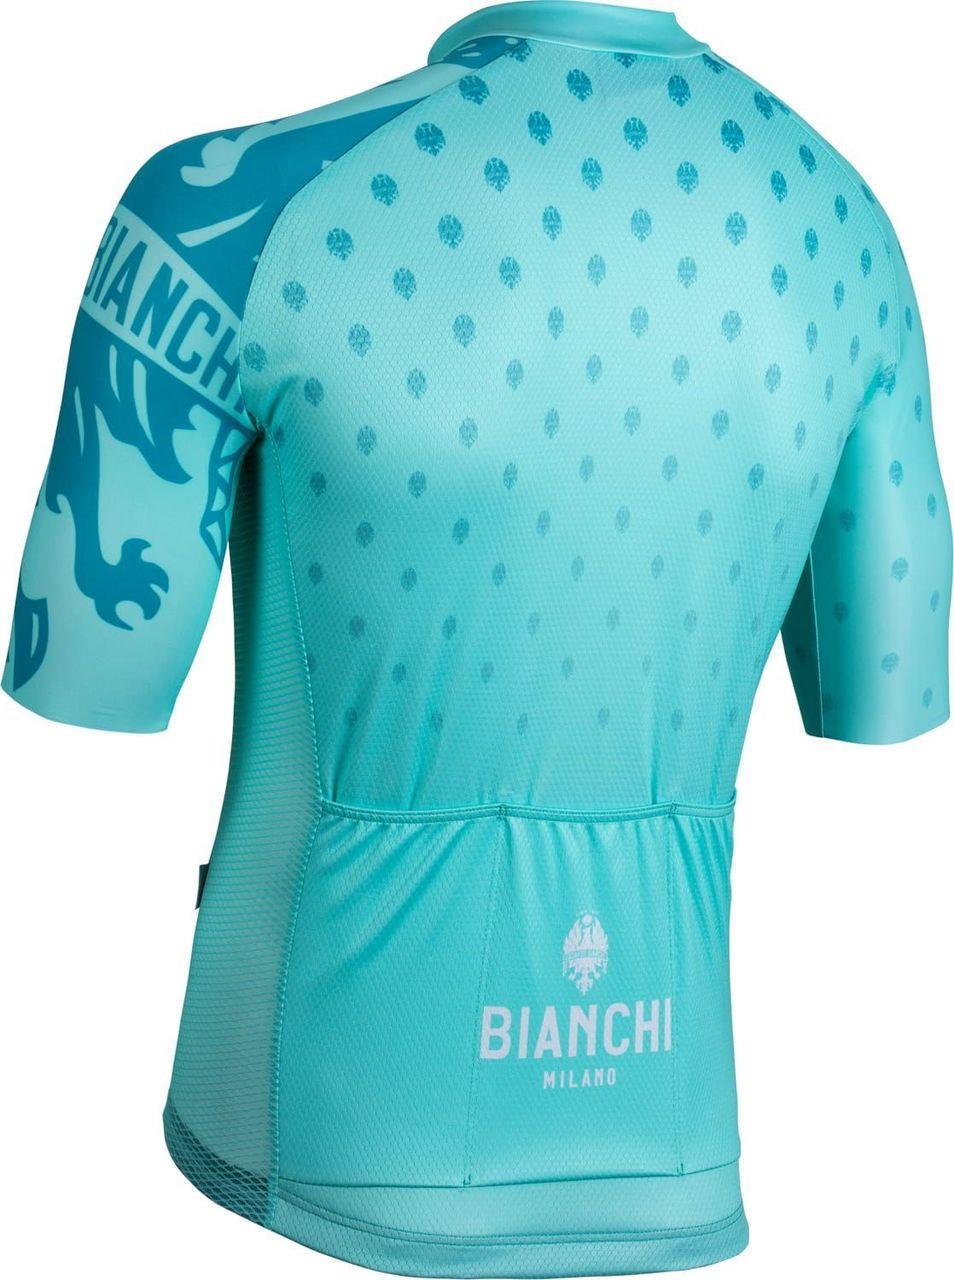 Bianchi Milano Savignano Green Jersey rear